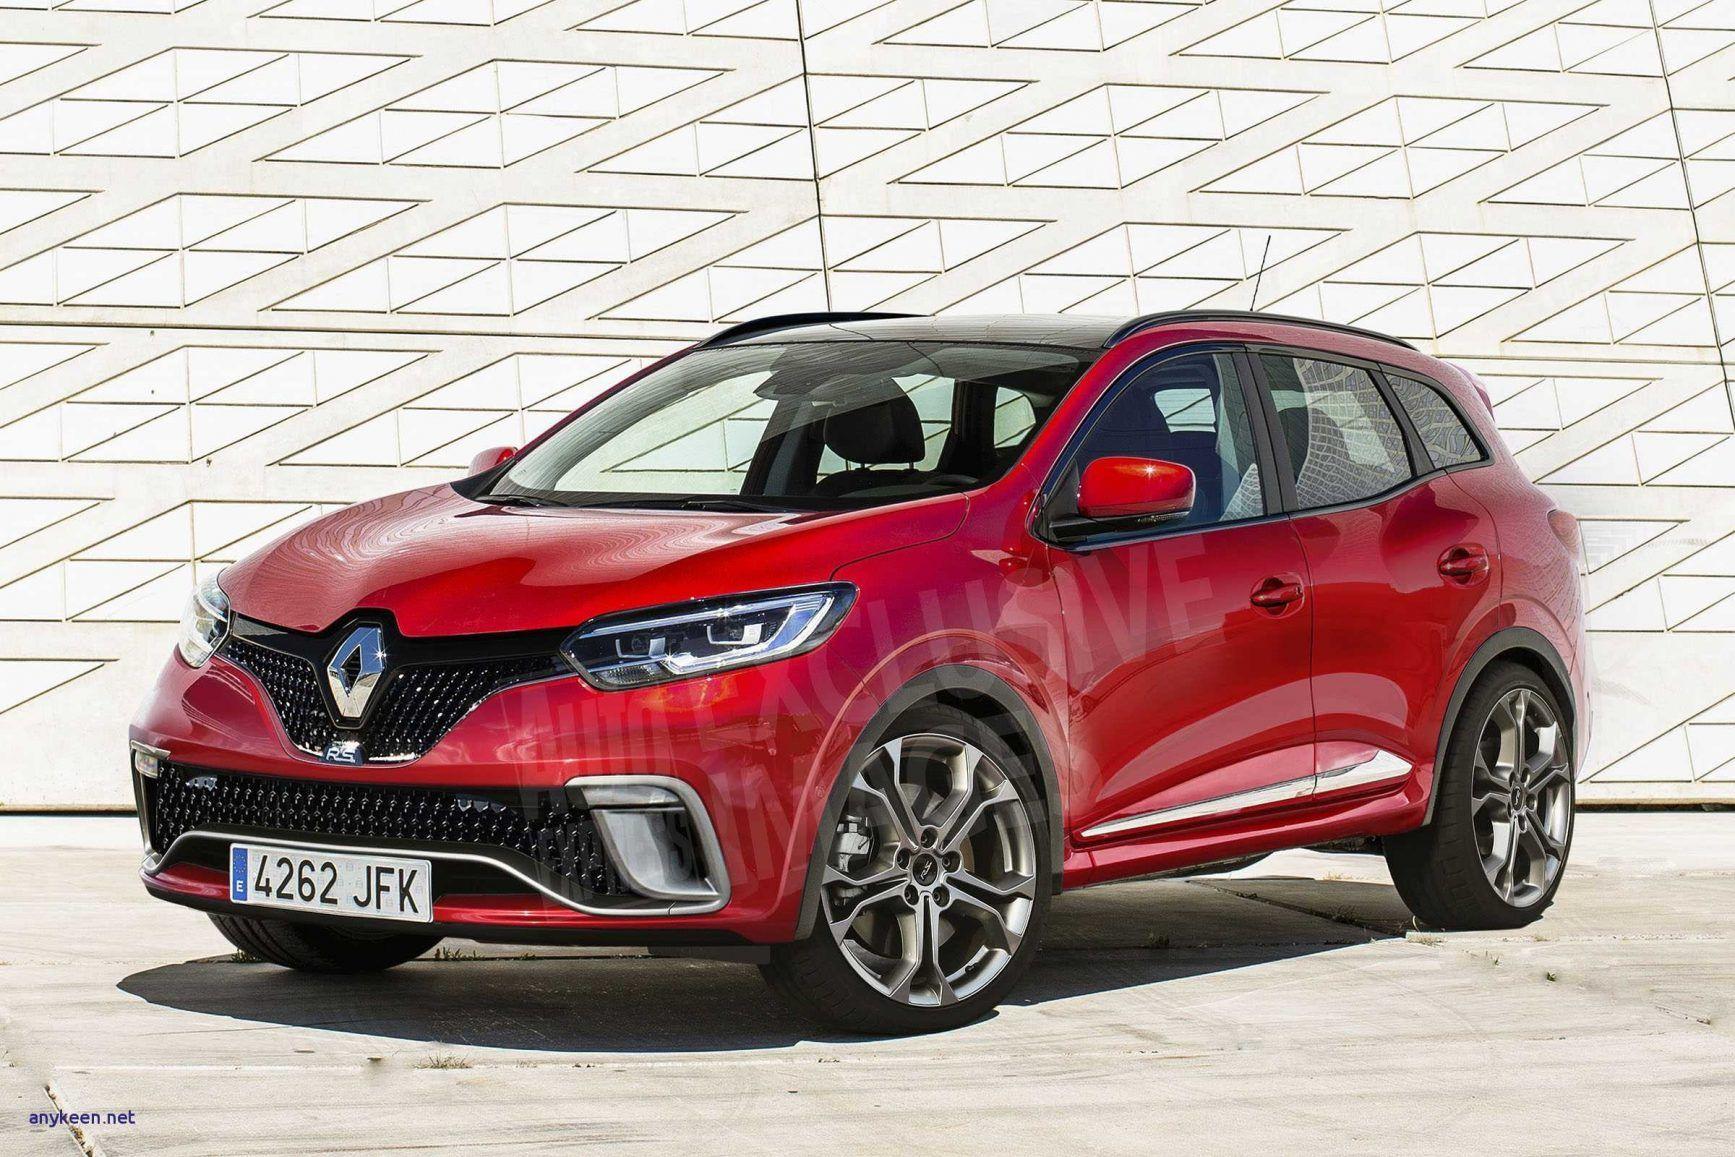 2020 Renault Kadjar Redesign, Interior >> The Approaching 2020 Renault Kadjar Is Getting A Mid Cycle